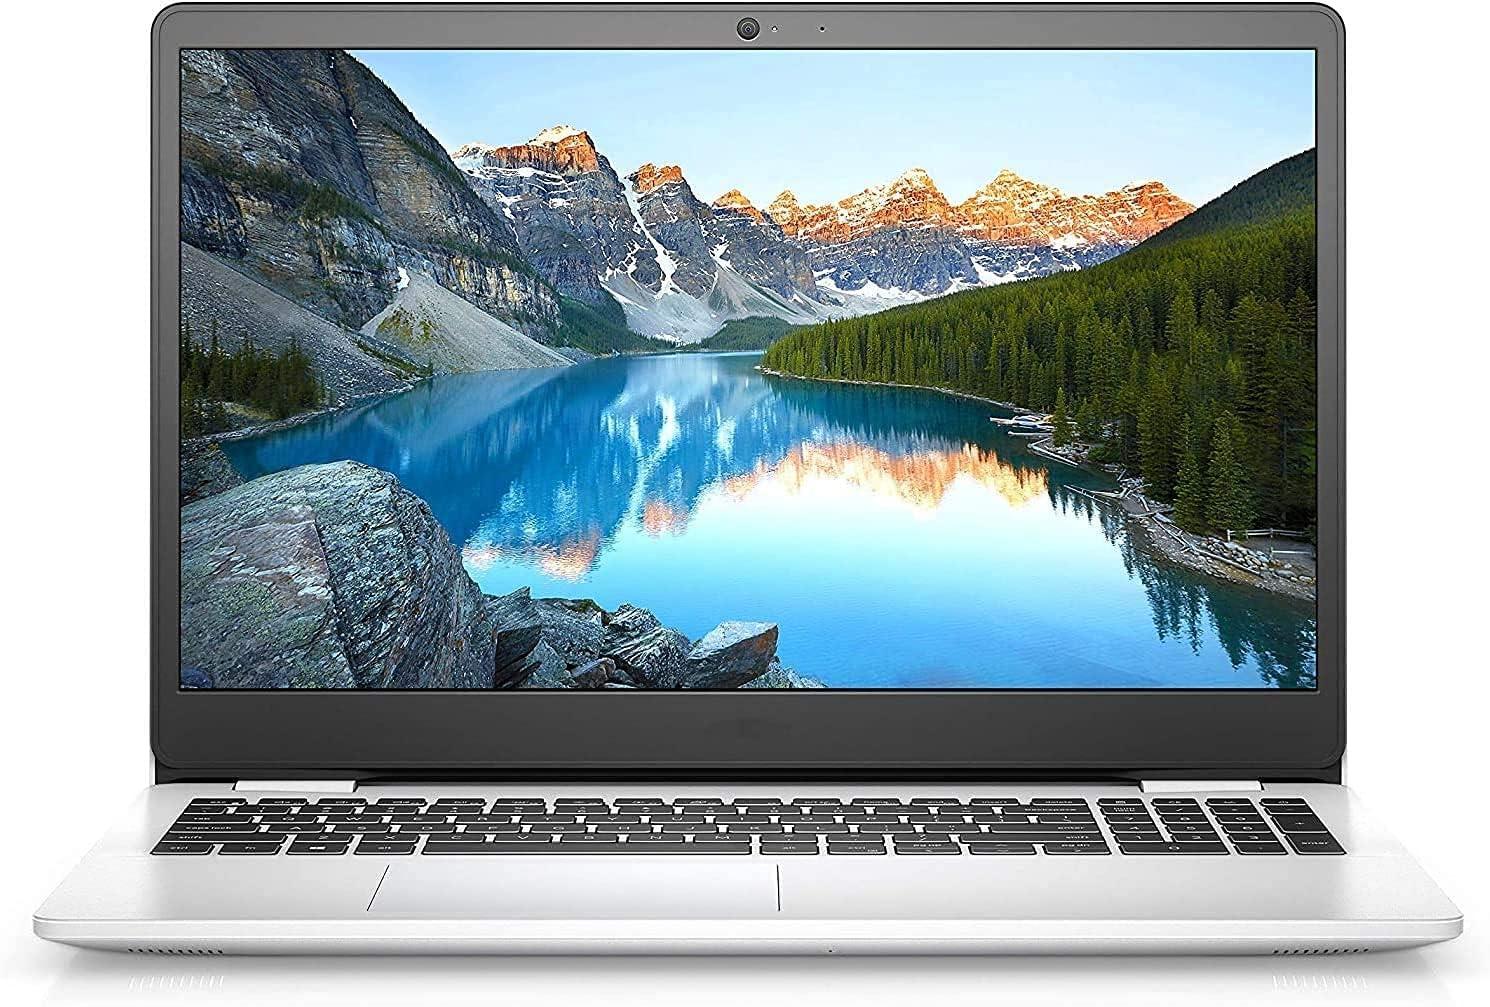 New_Dell_Inspiron 15 3000 FHD 15.6 Inch Laptop Student Business Computer, AMD Ryzen 3 (Beat Intel Core i3-10110U), 8GB RAM, 256GB SSD, HDMI, WiFi, Bluetooth, Win 10, 1-Week AimCare Sup.